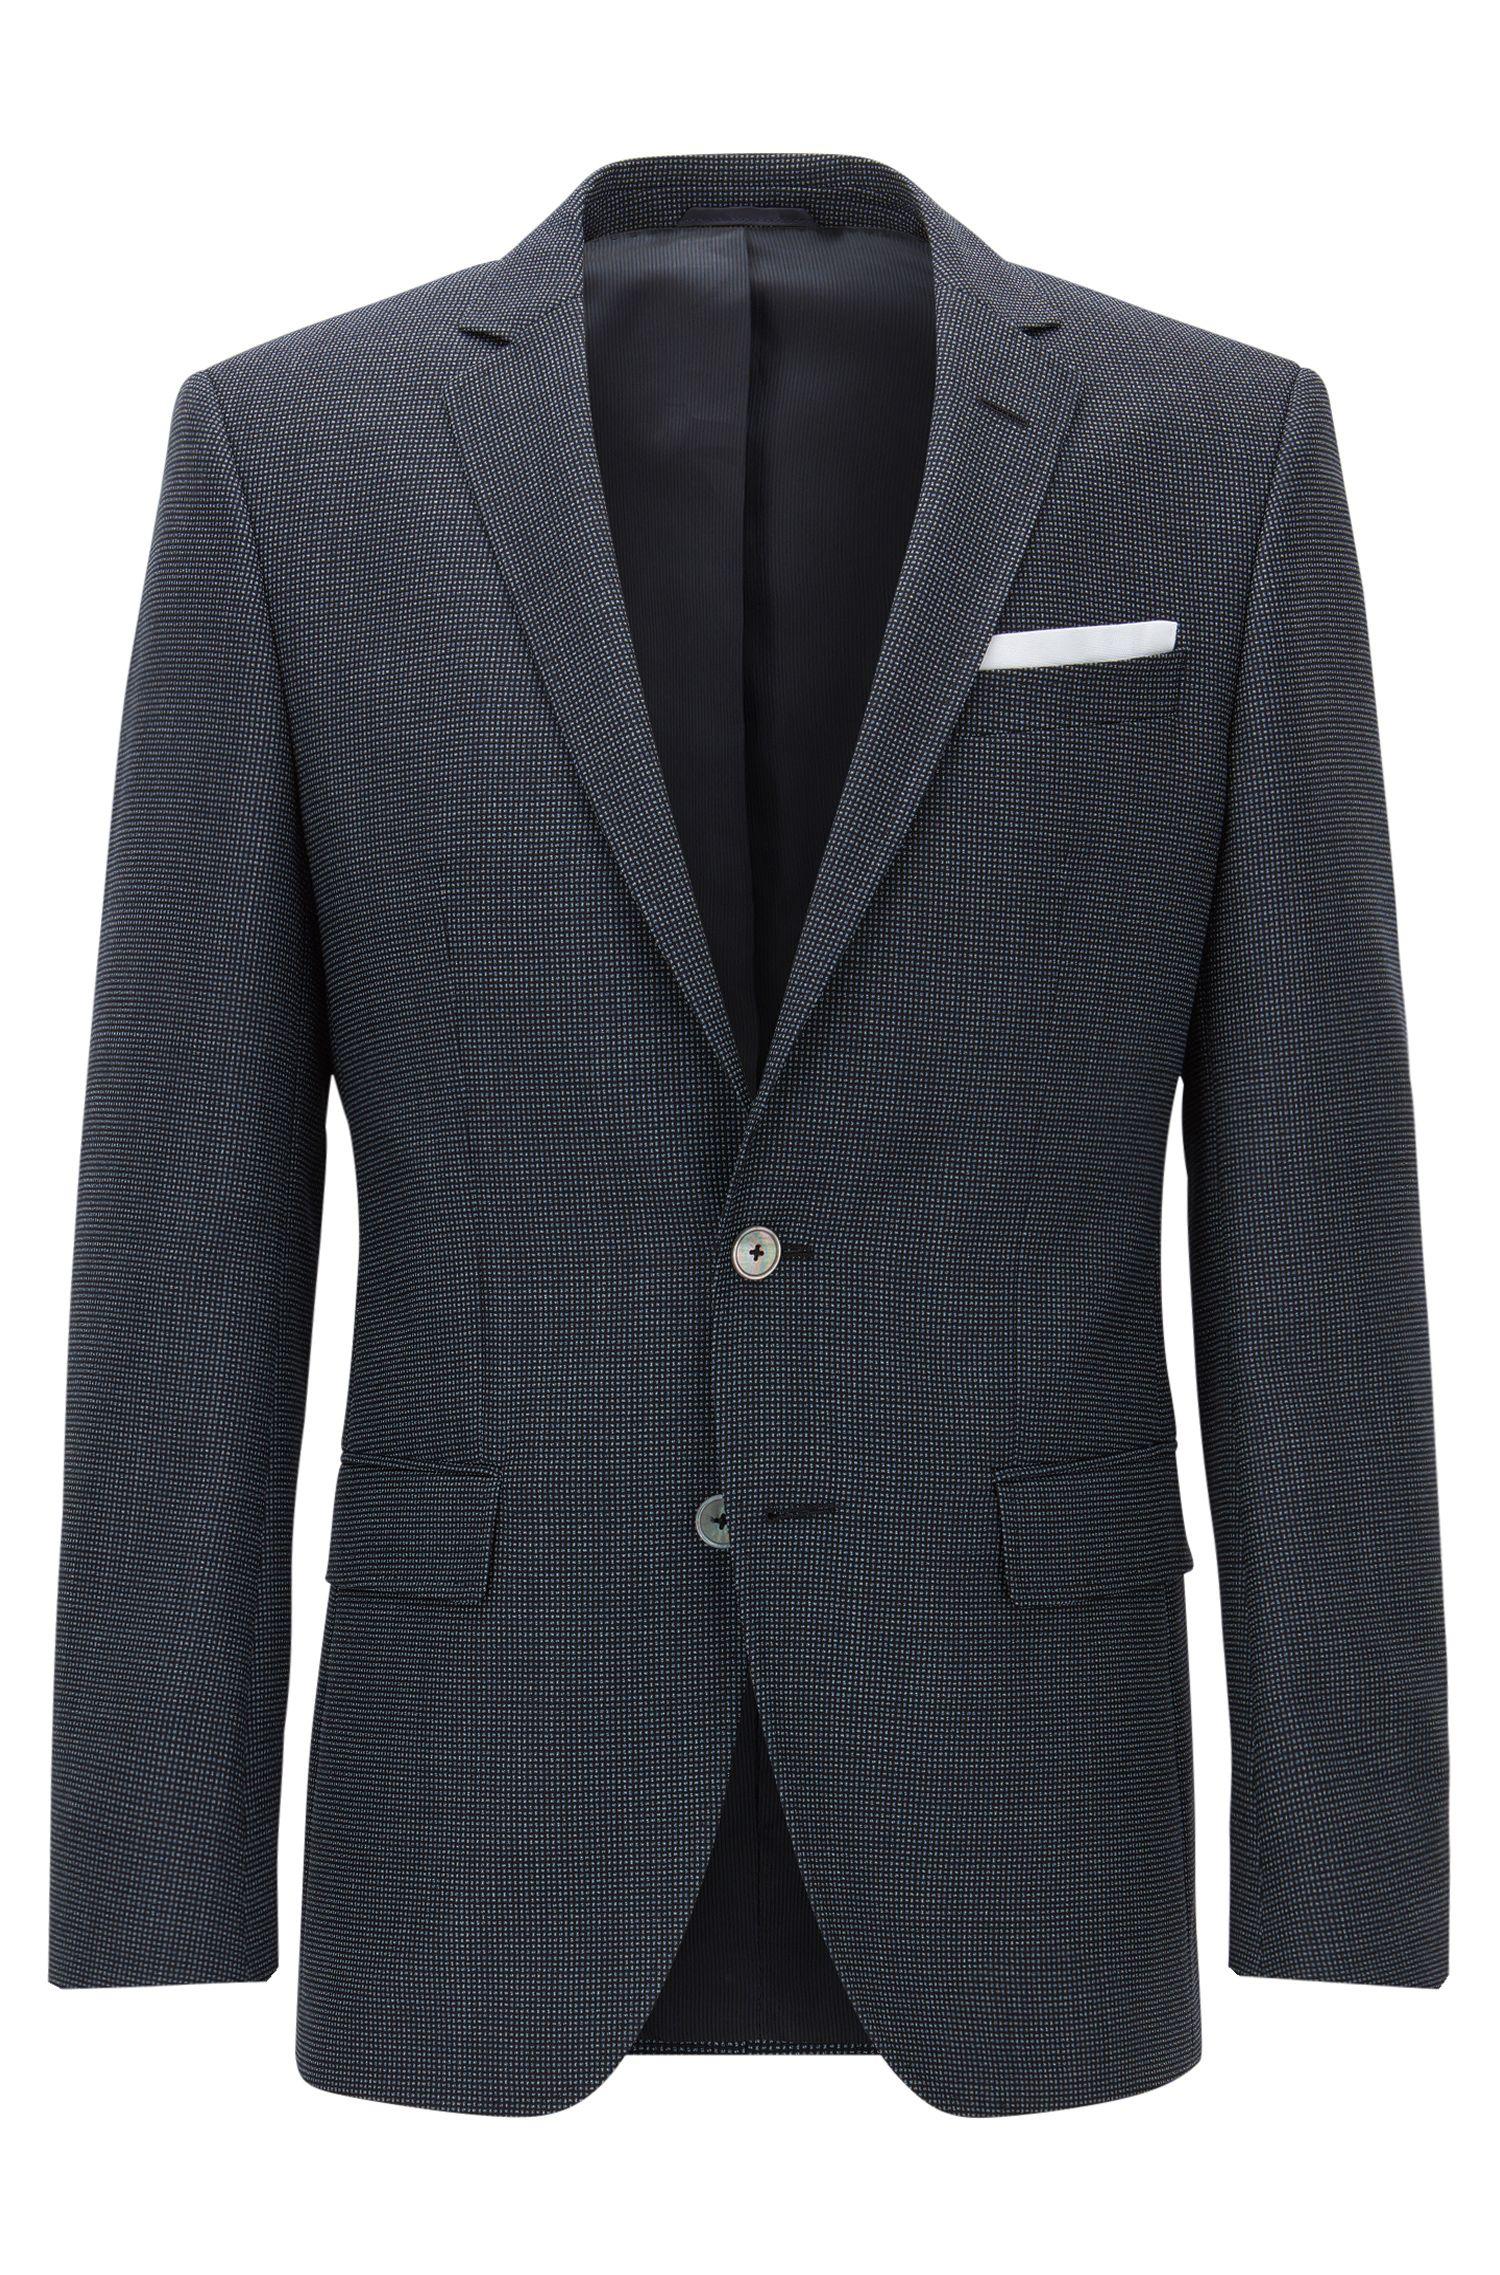 'Hutsons' | Slim Fit, Nailhead Virgin Wool Sport Coat